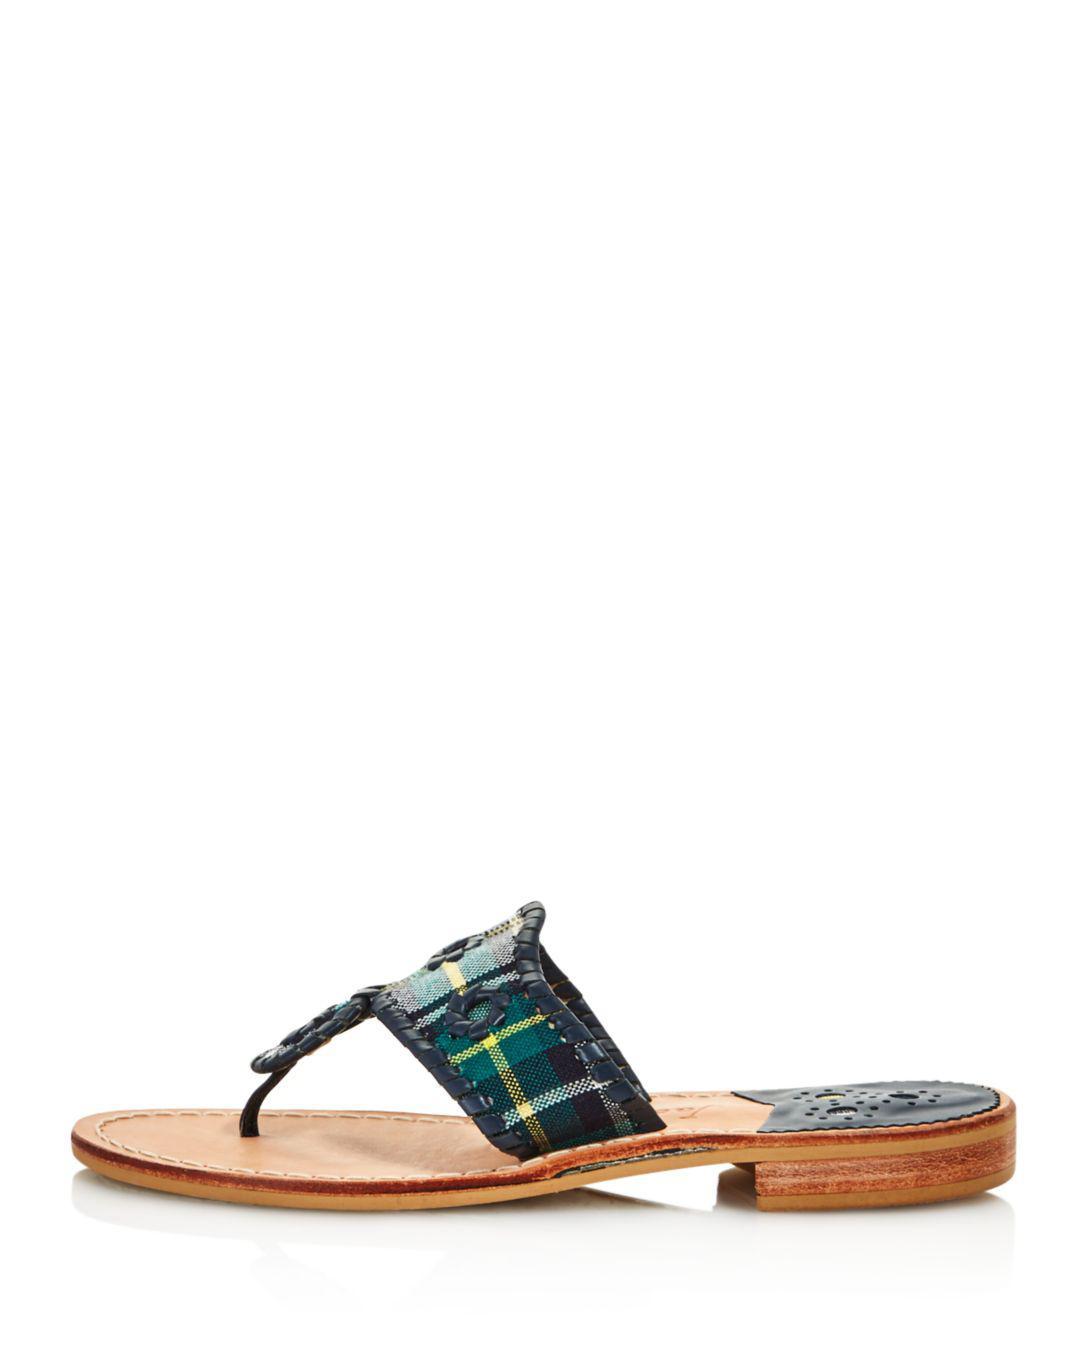 6c0bb8d4bd98 Jack Rogers Women s Jacks Thong Sandals in Green - Lyst